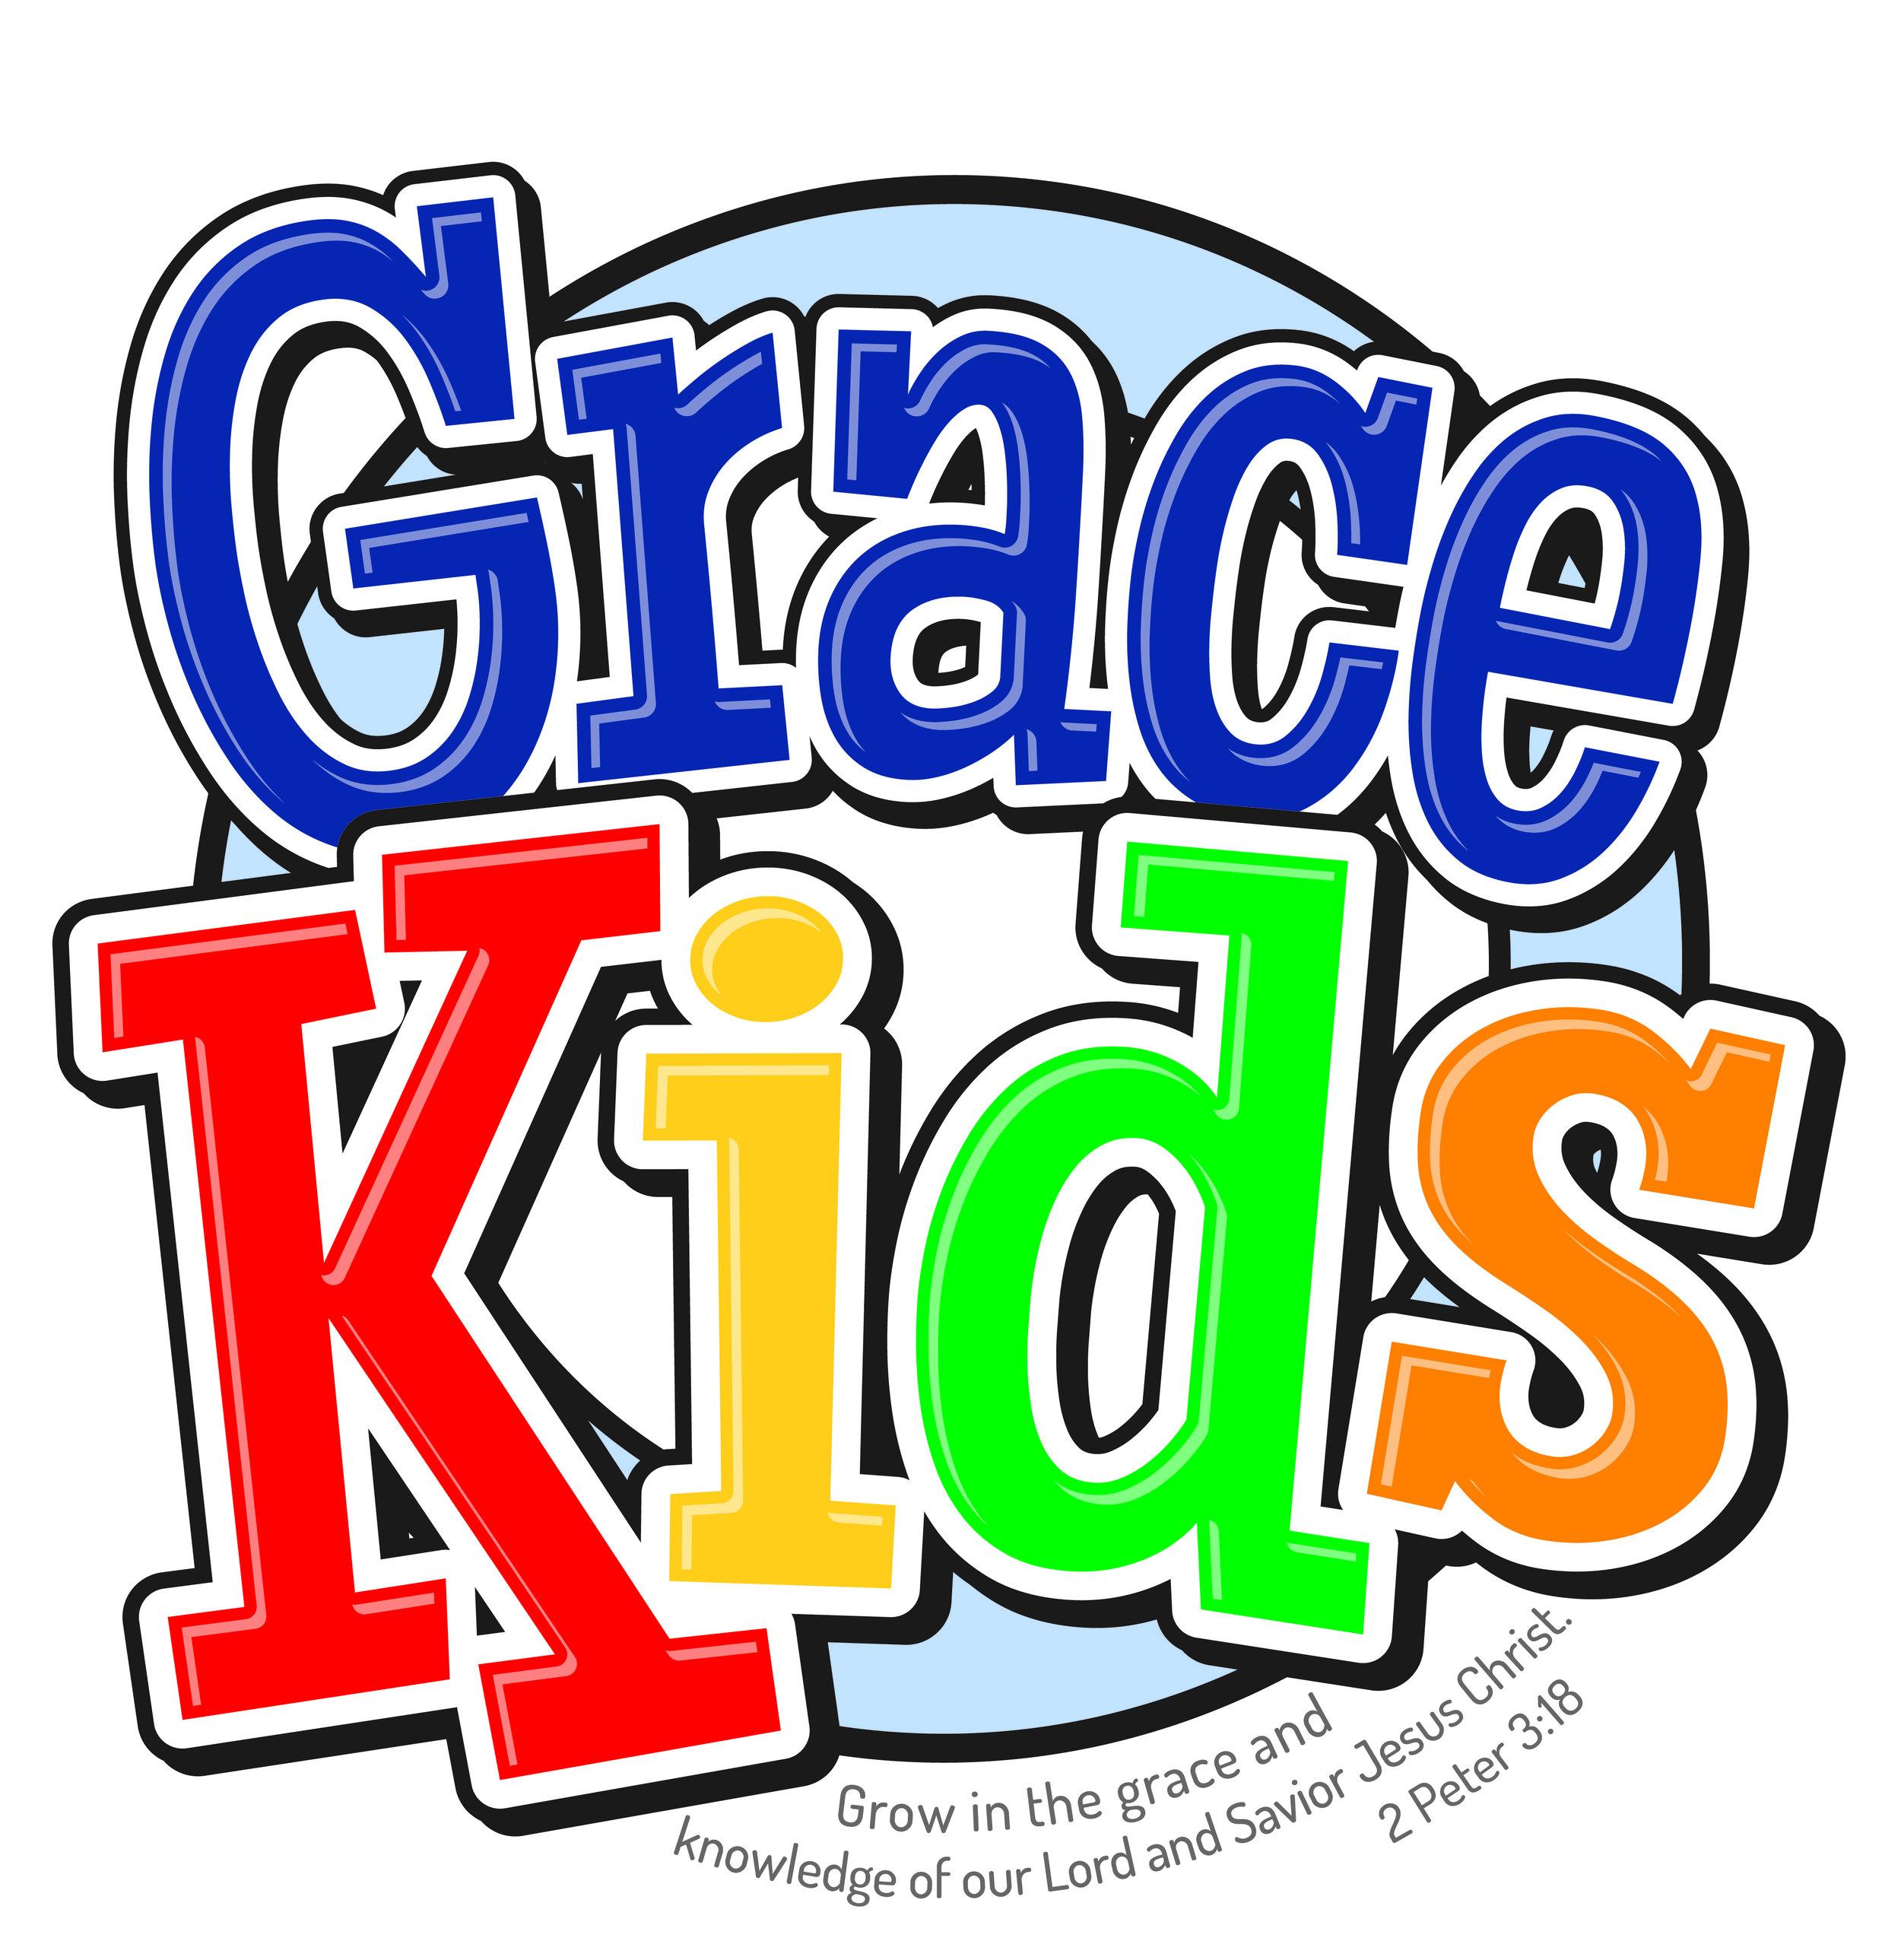 grace-kids-with-print.jpg